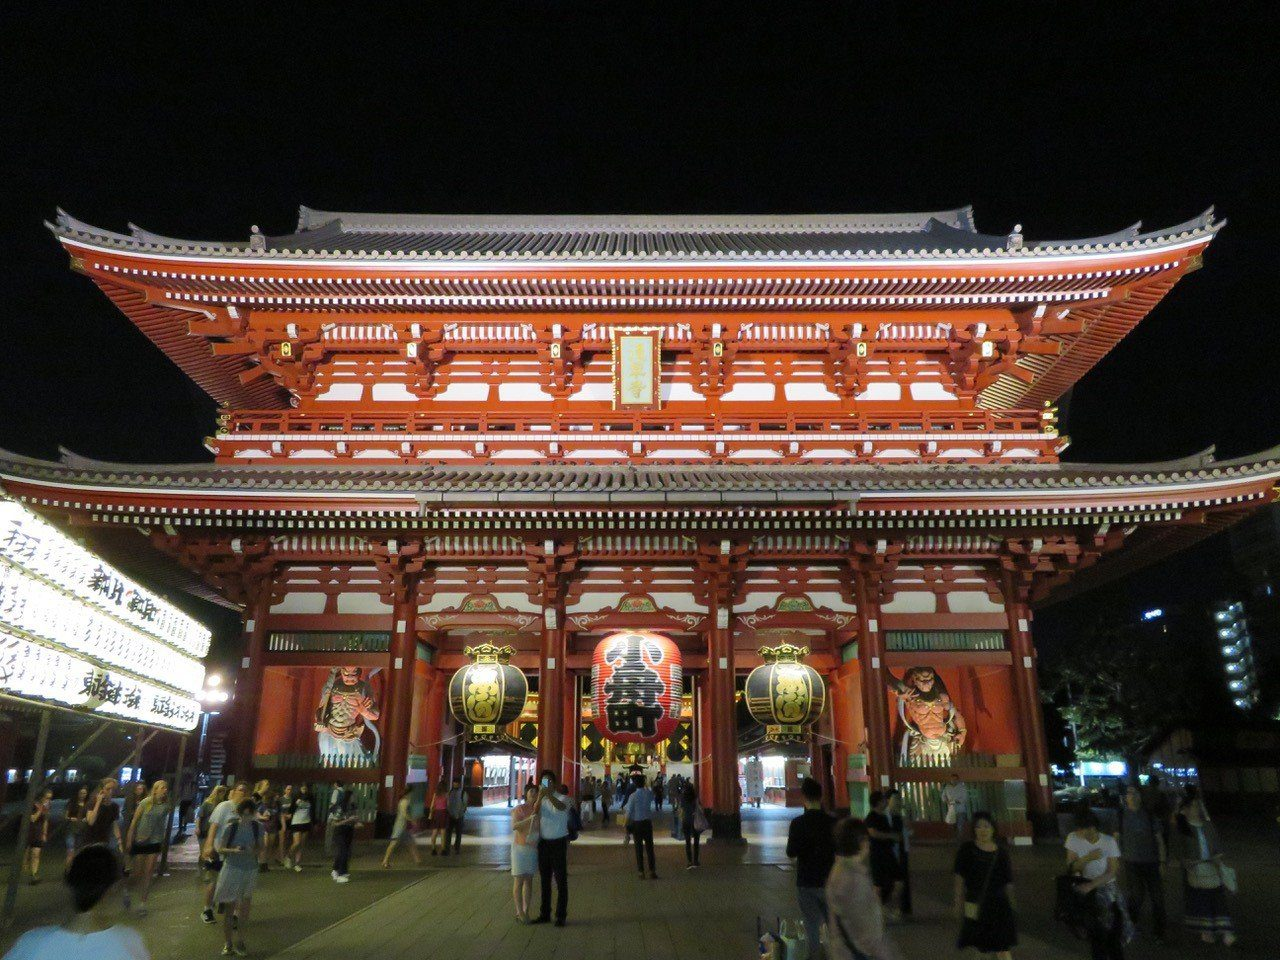 Senso-Ji Temple - Our 3 Kids V The World